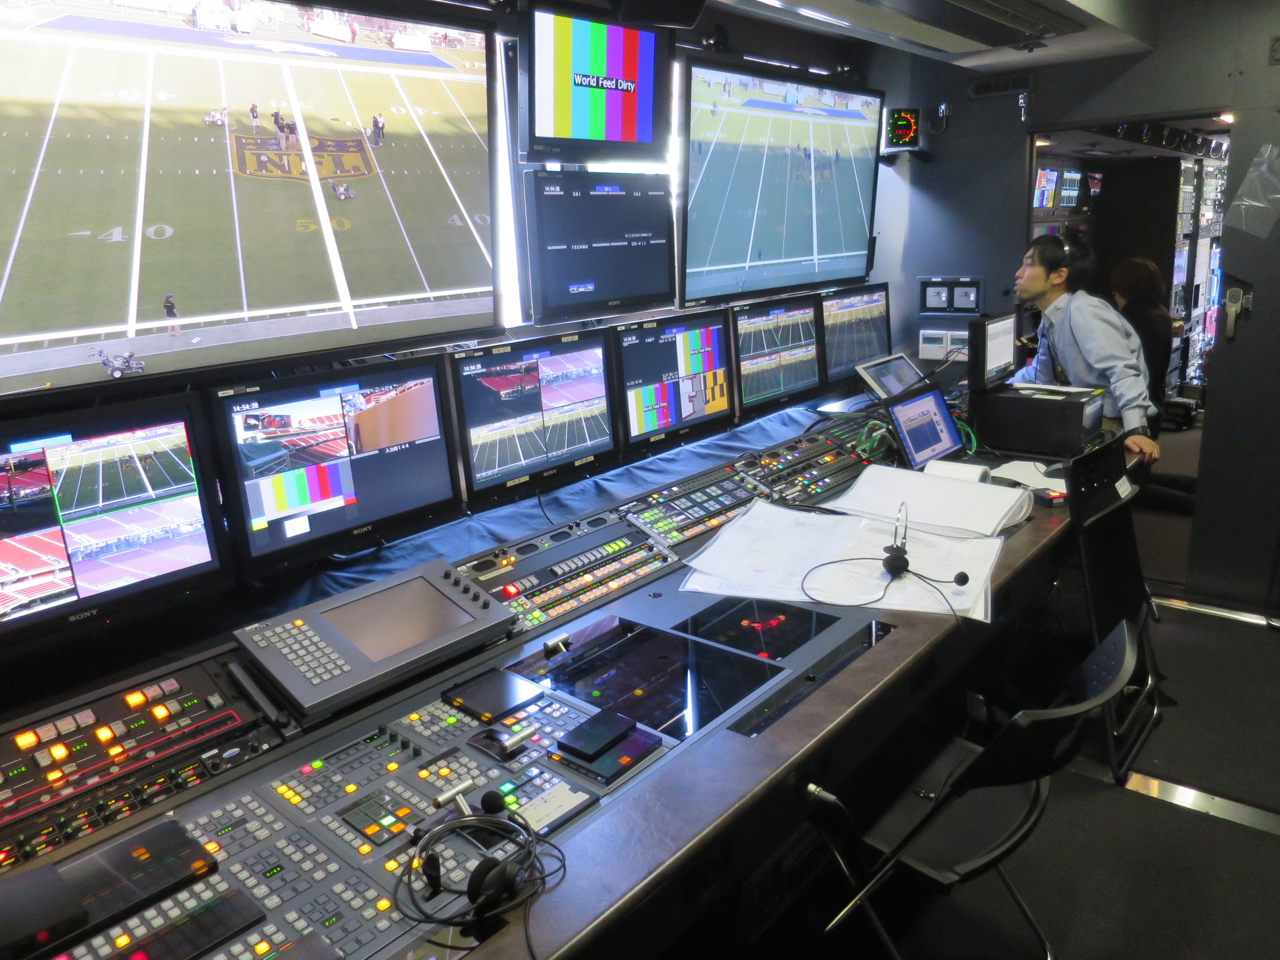 Super Bowl 50 NHKs Newest 8K Mobile Unit Brings The Big